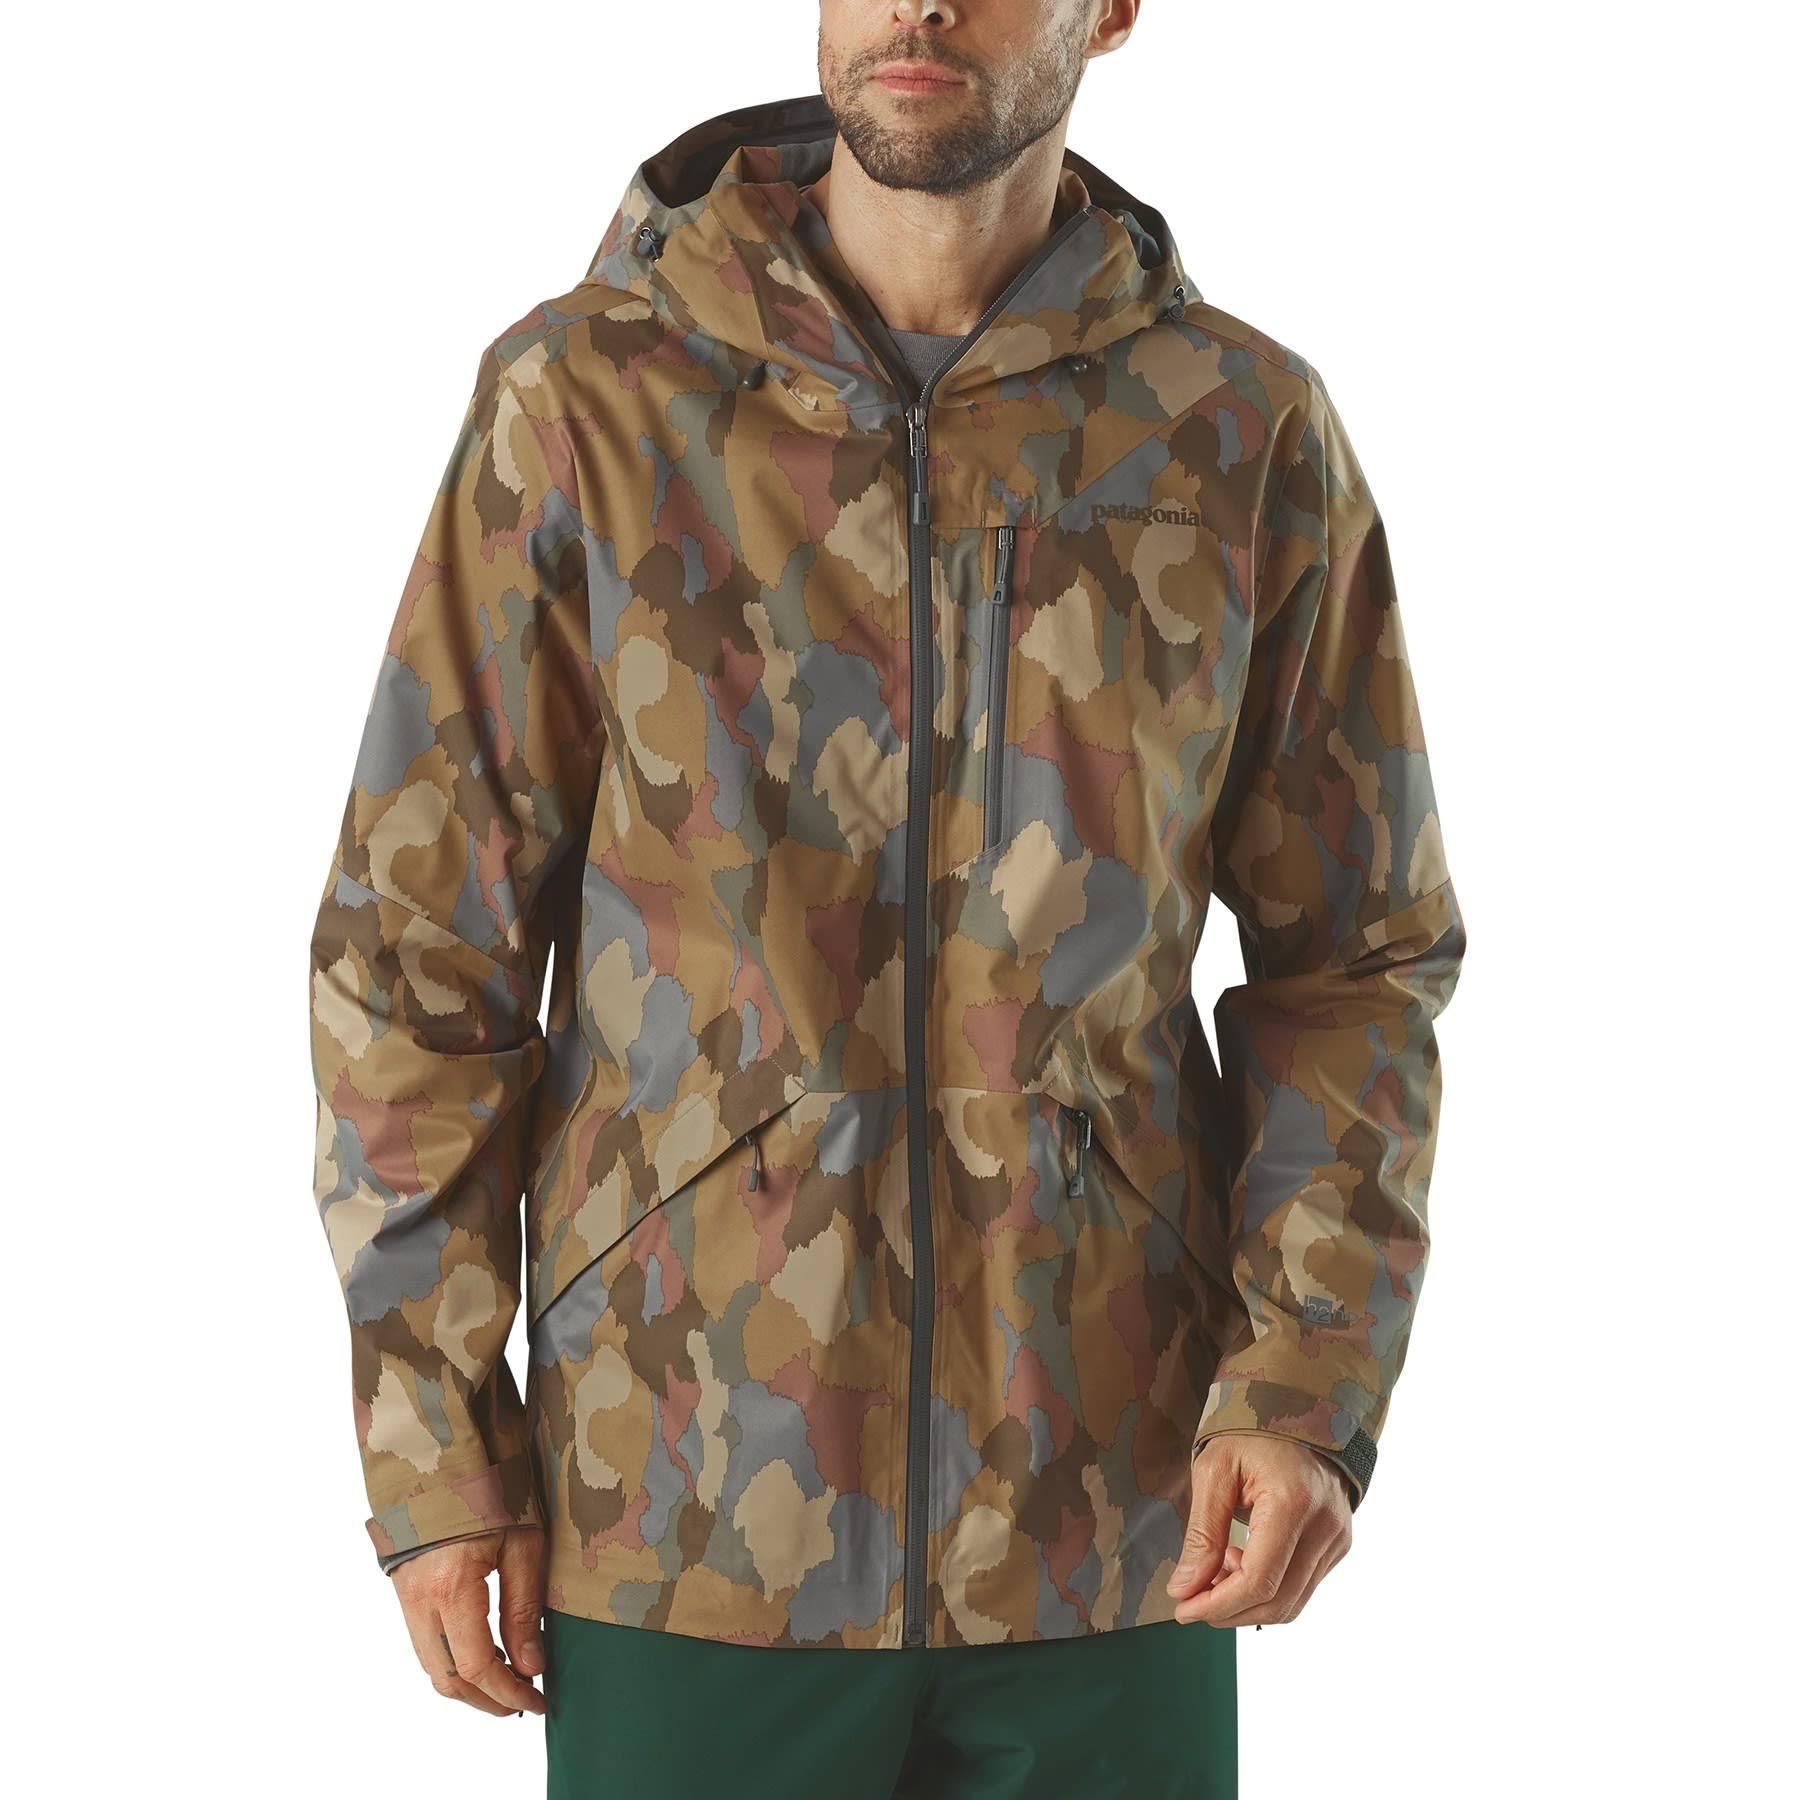 Multi Snowshot Mojave Hombre Camo Patagonia S Jacket Para Bunker Khaki dOqwnHIa8